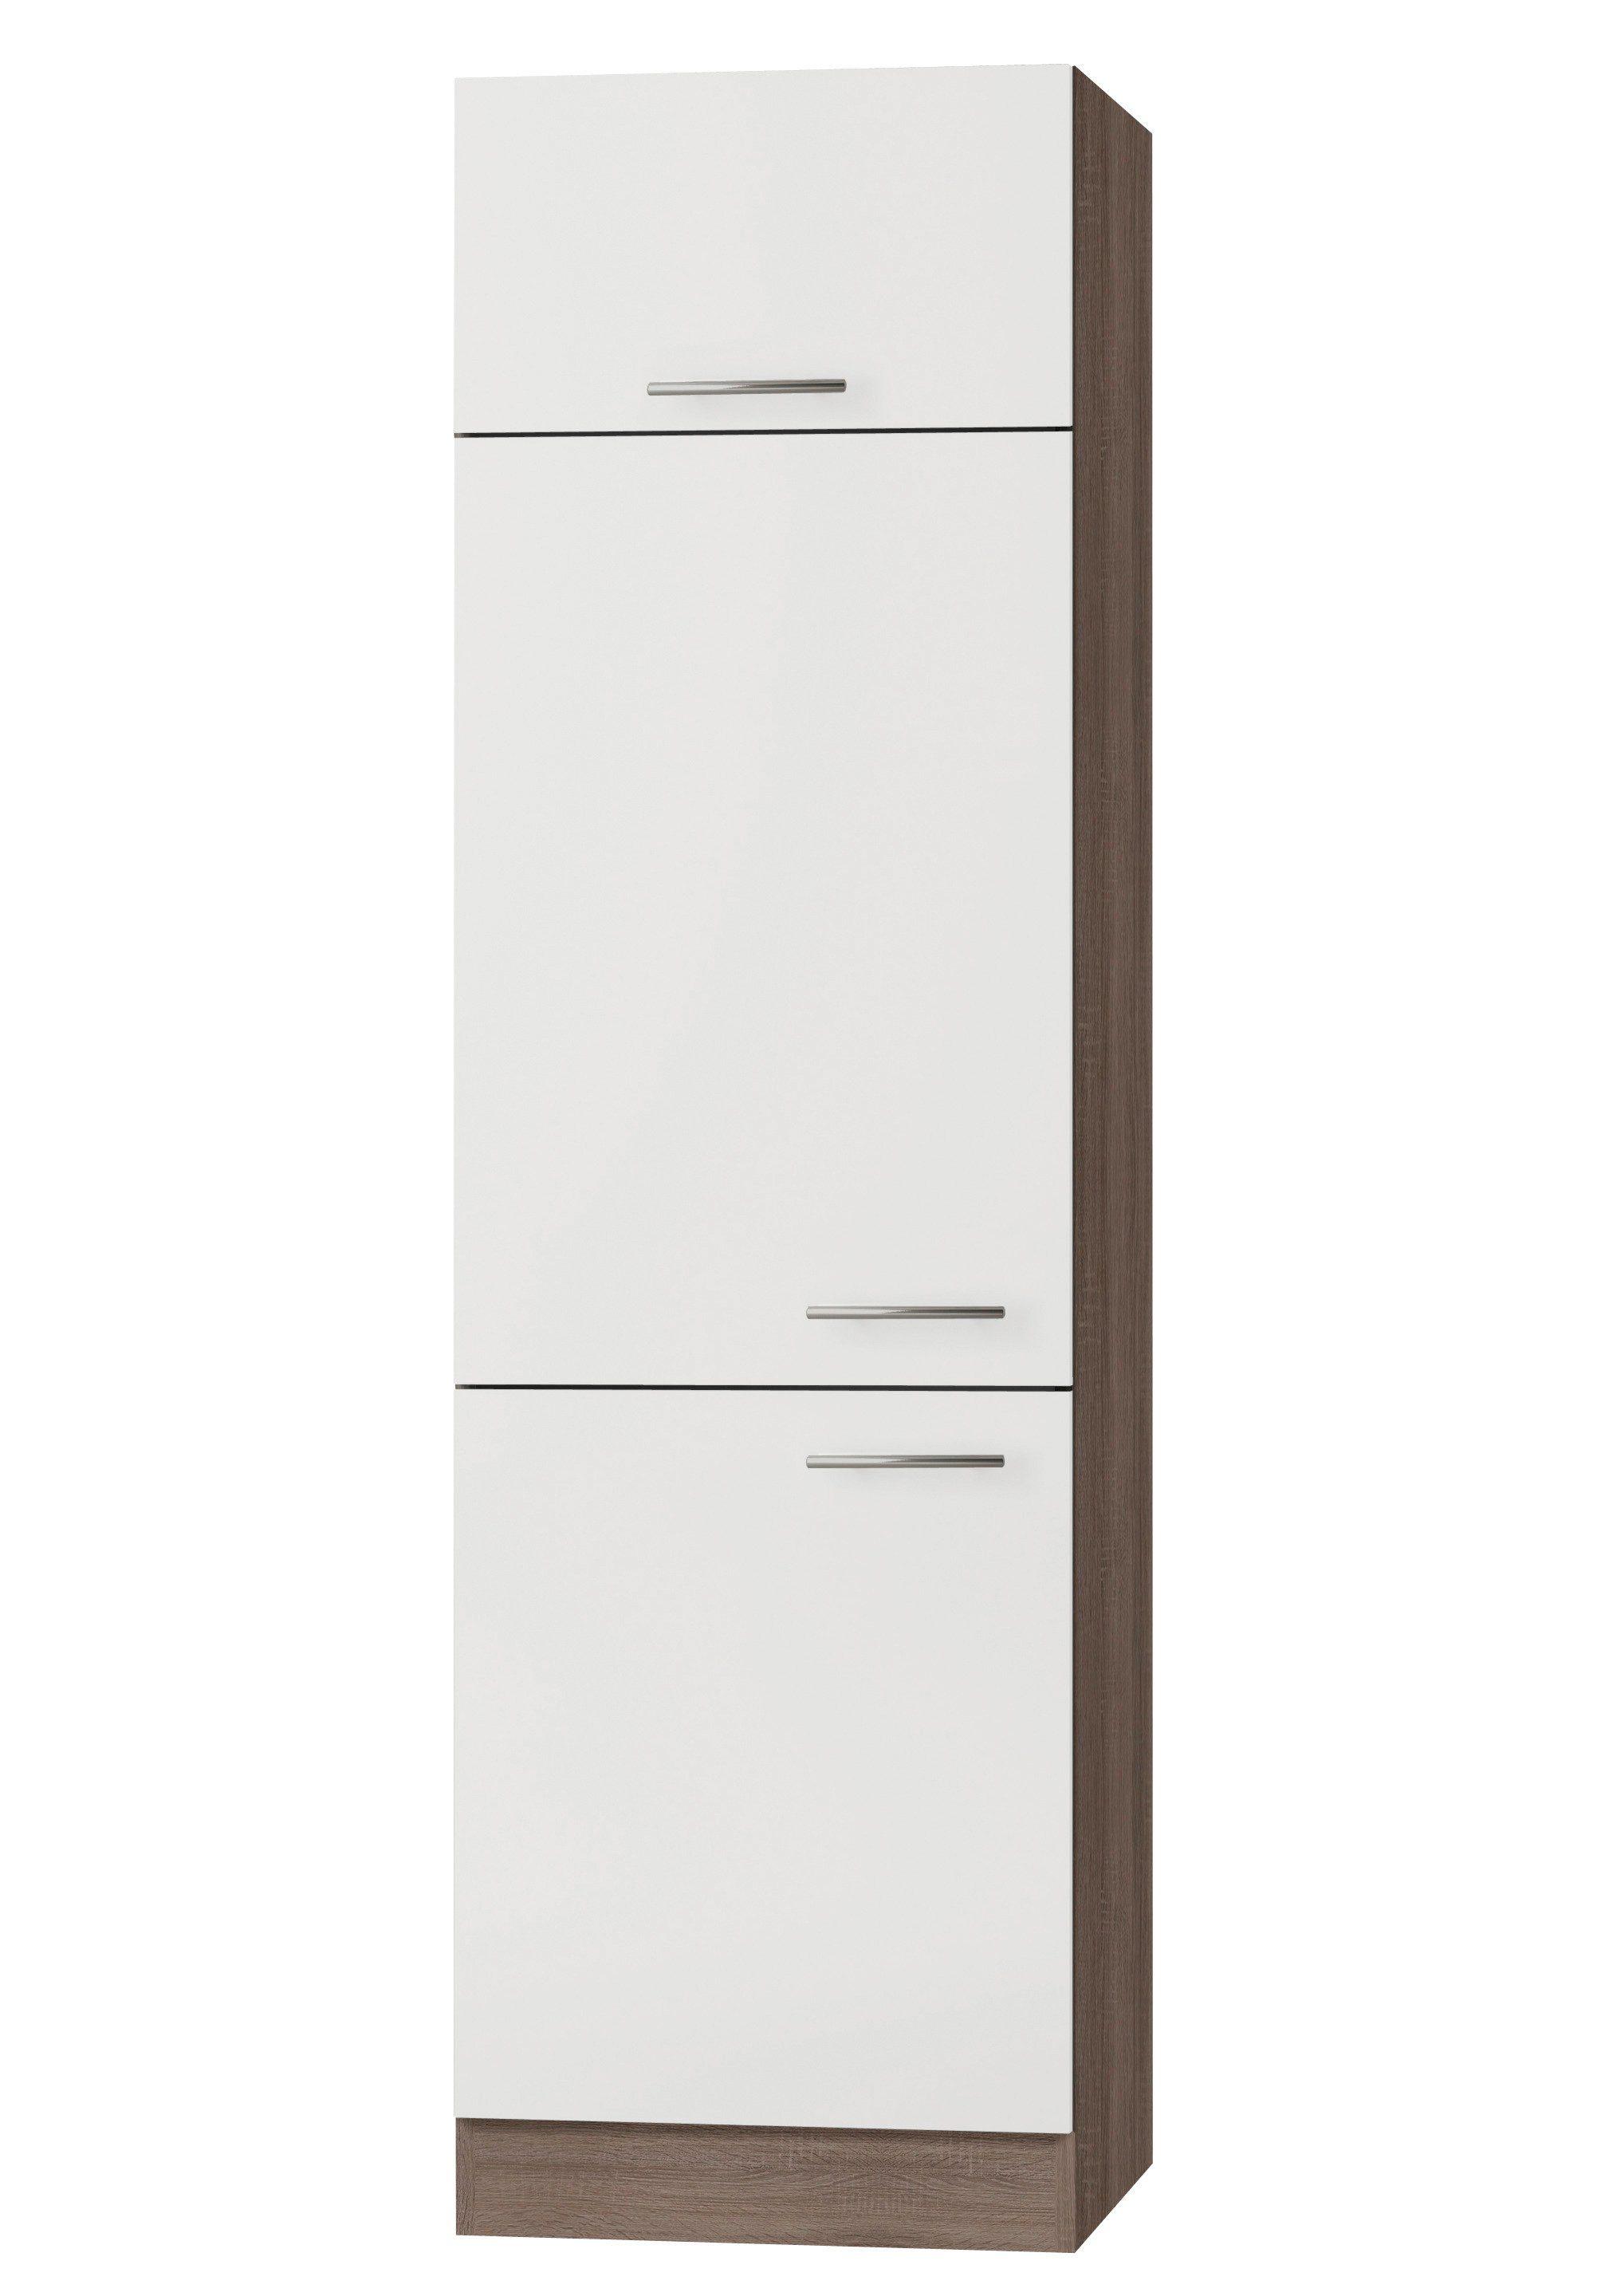 Optifit Kühlumbauschrank »Rabat«, Höhe 206,8 cm